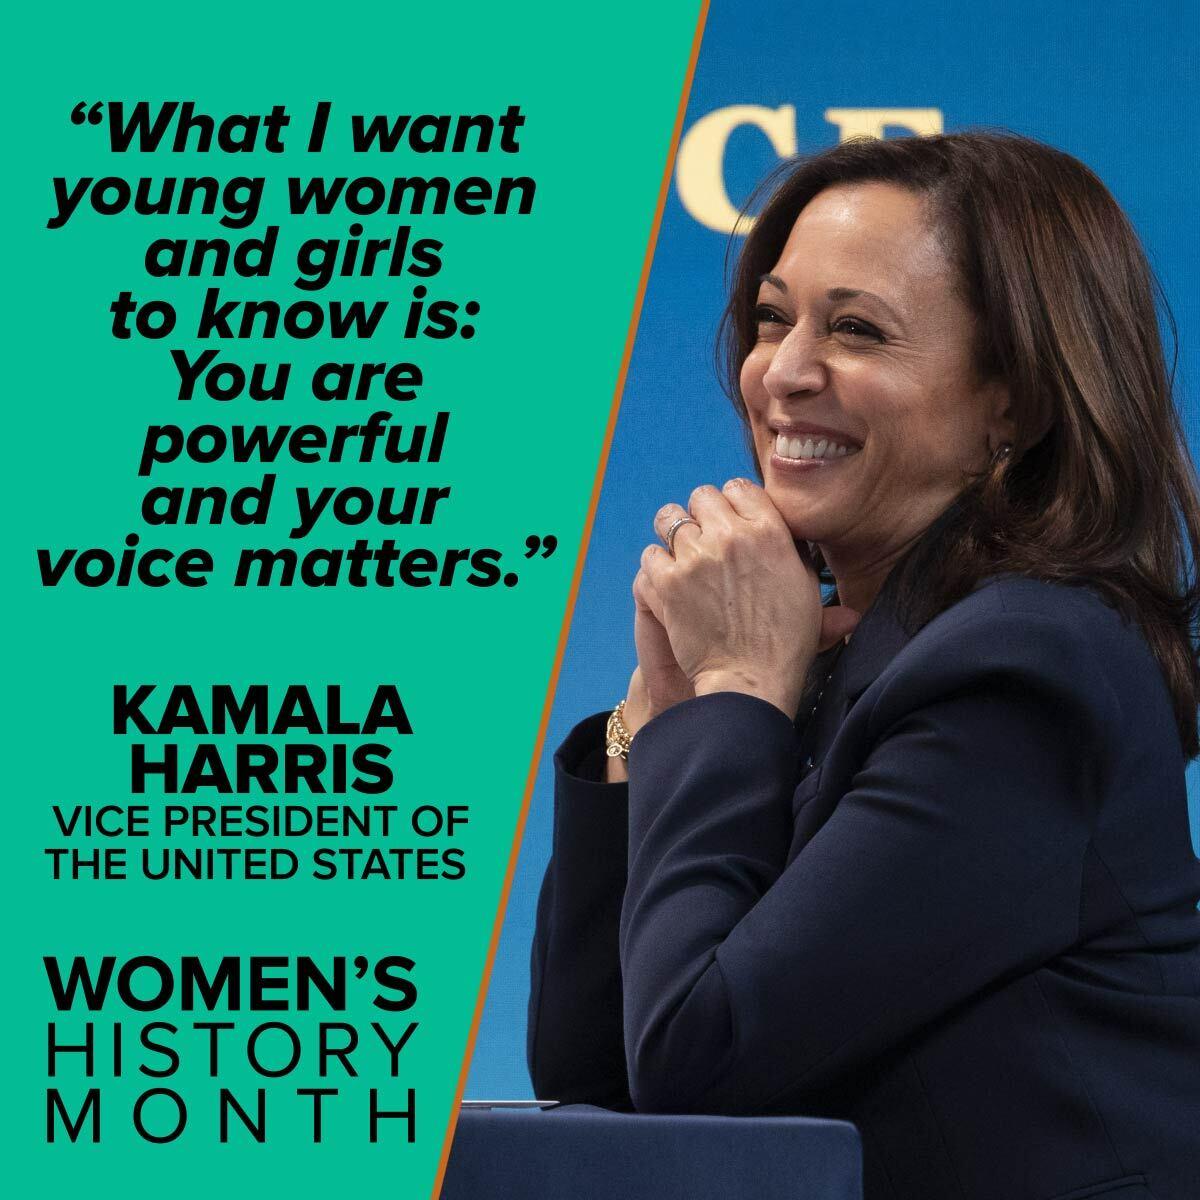 Women's History Month_Kamala Harris.jpg